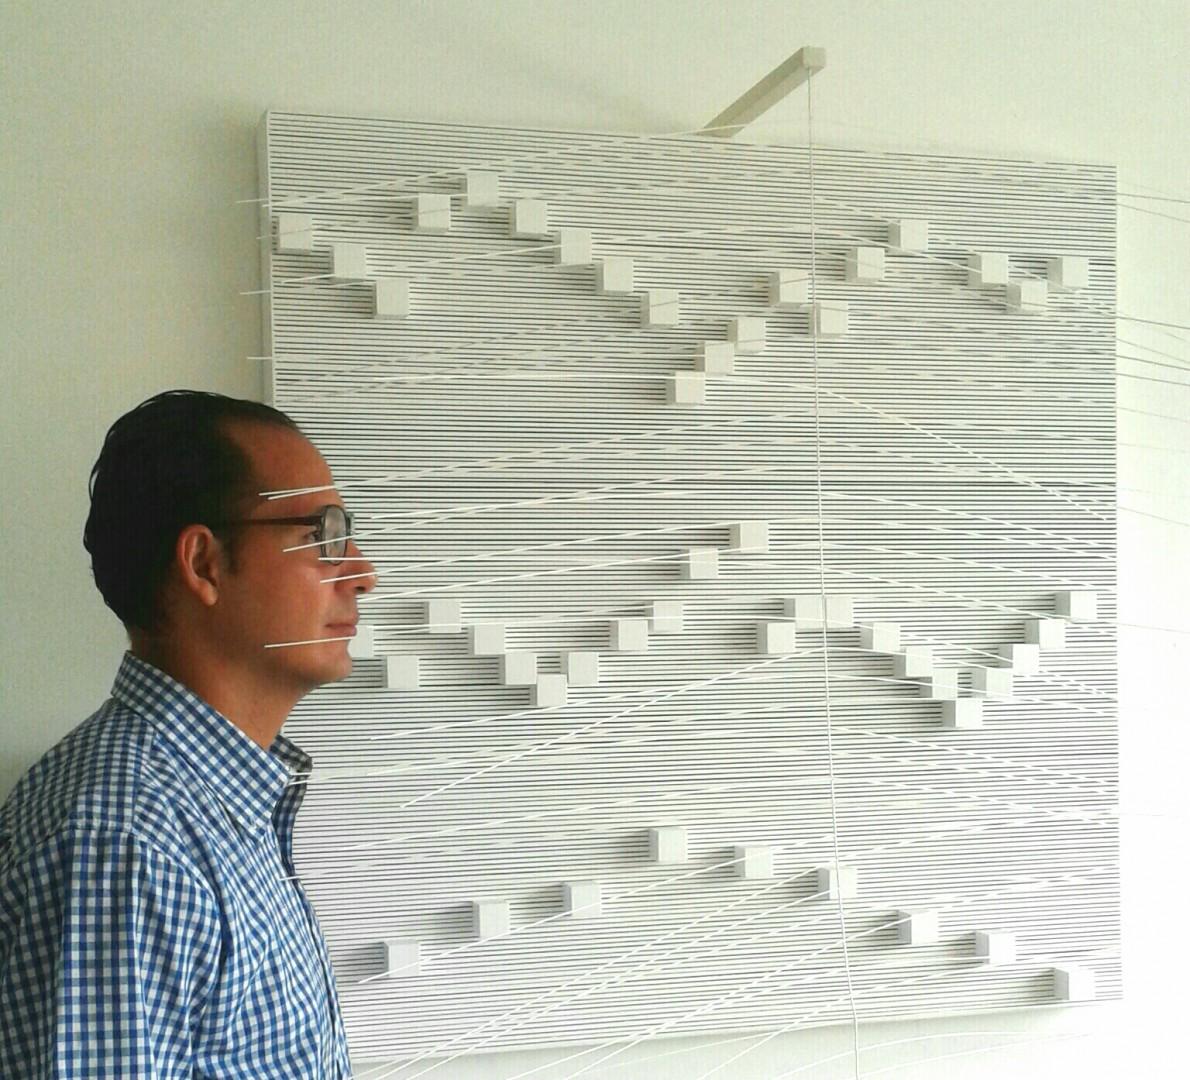 Manuel Rangel Angarita